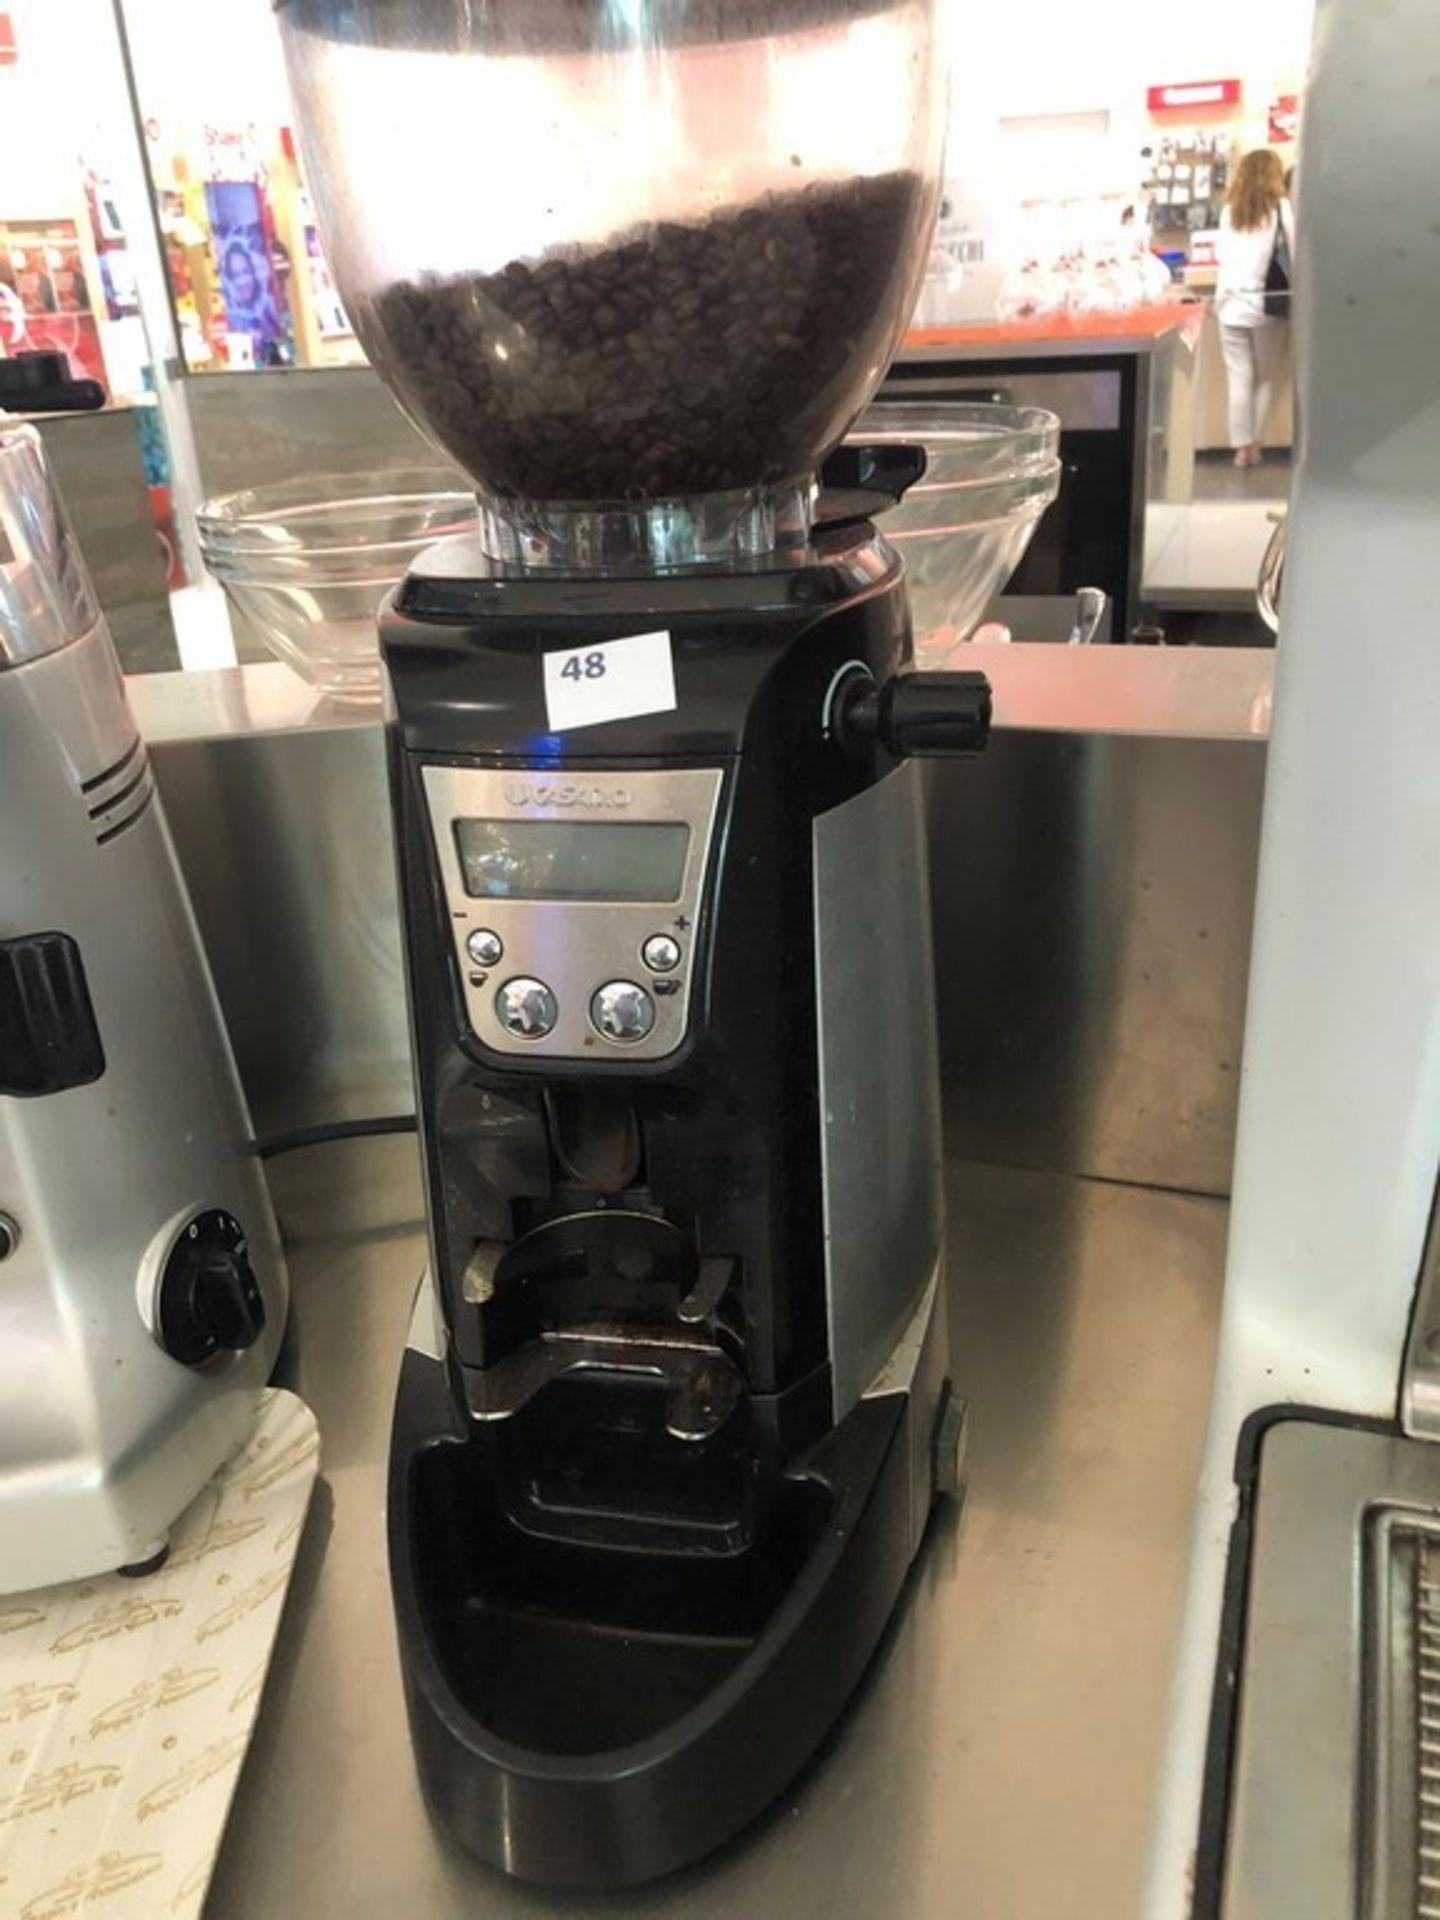 Lotto 50 - N. 48 (FALL. N. 102/19 VR) MACINA CAFFE' CON DOSATORE CASADIO